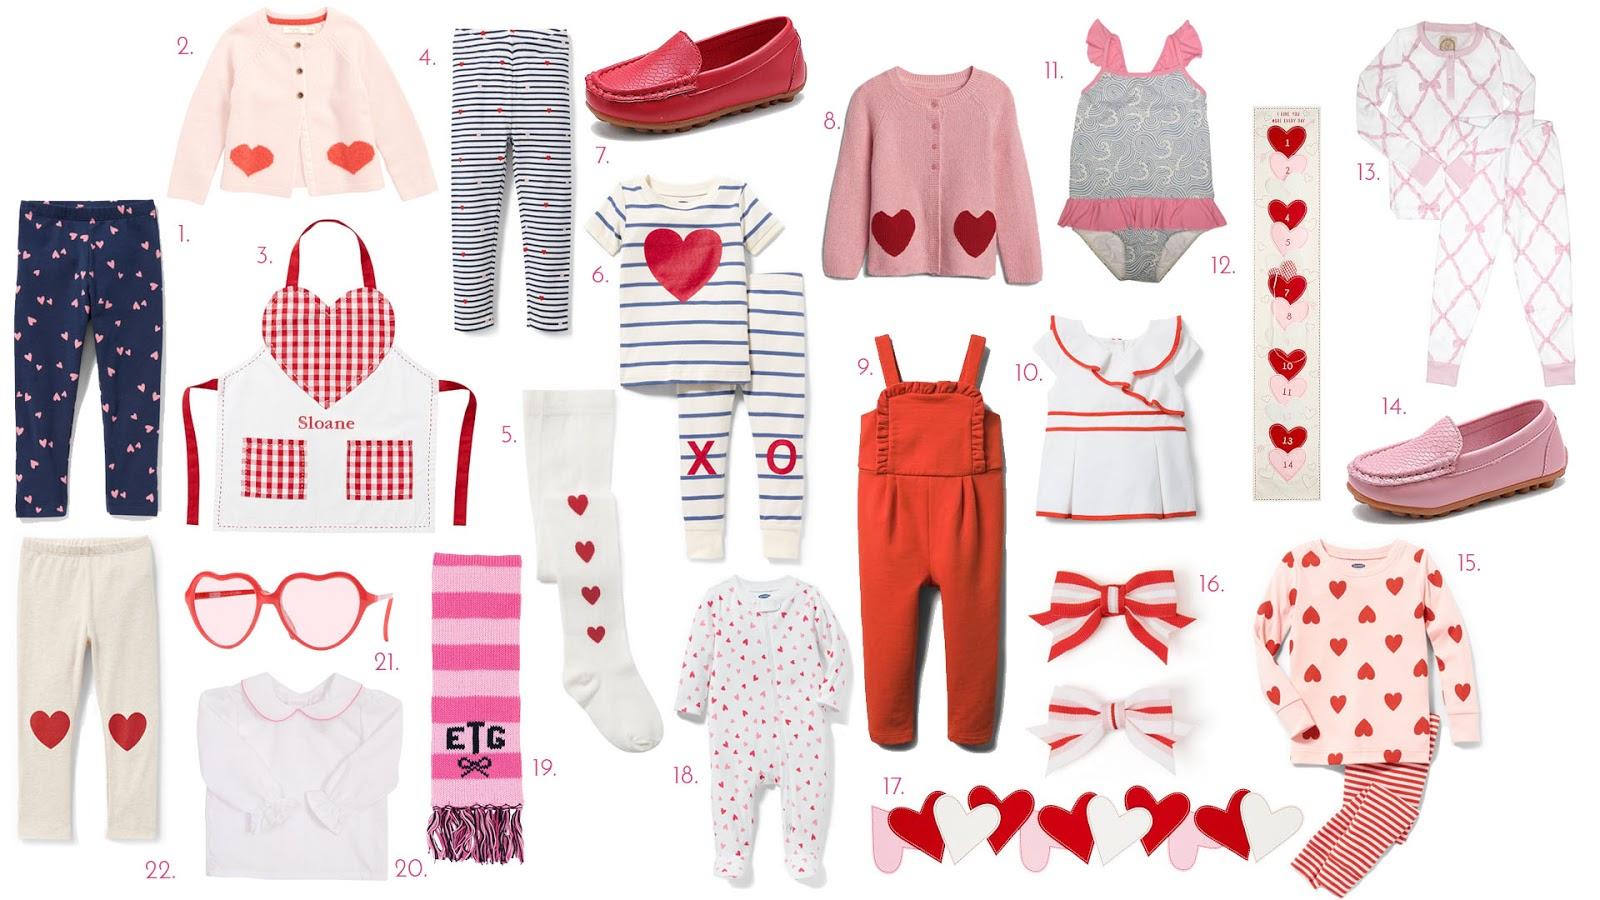 59d977028b8b0 Stripe Heart Leggings (sizes 3mos-12Girls ). 5. Heart Tights (sizes 0-6mos  - 10/12 Girls). 6.